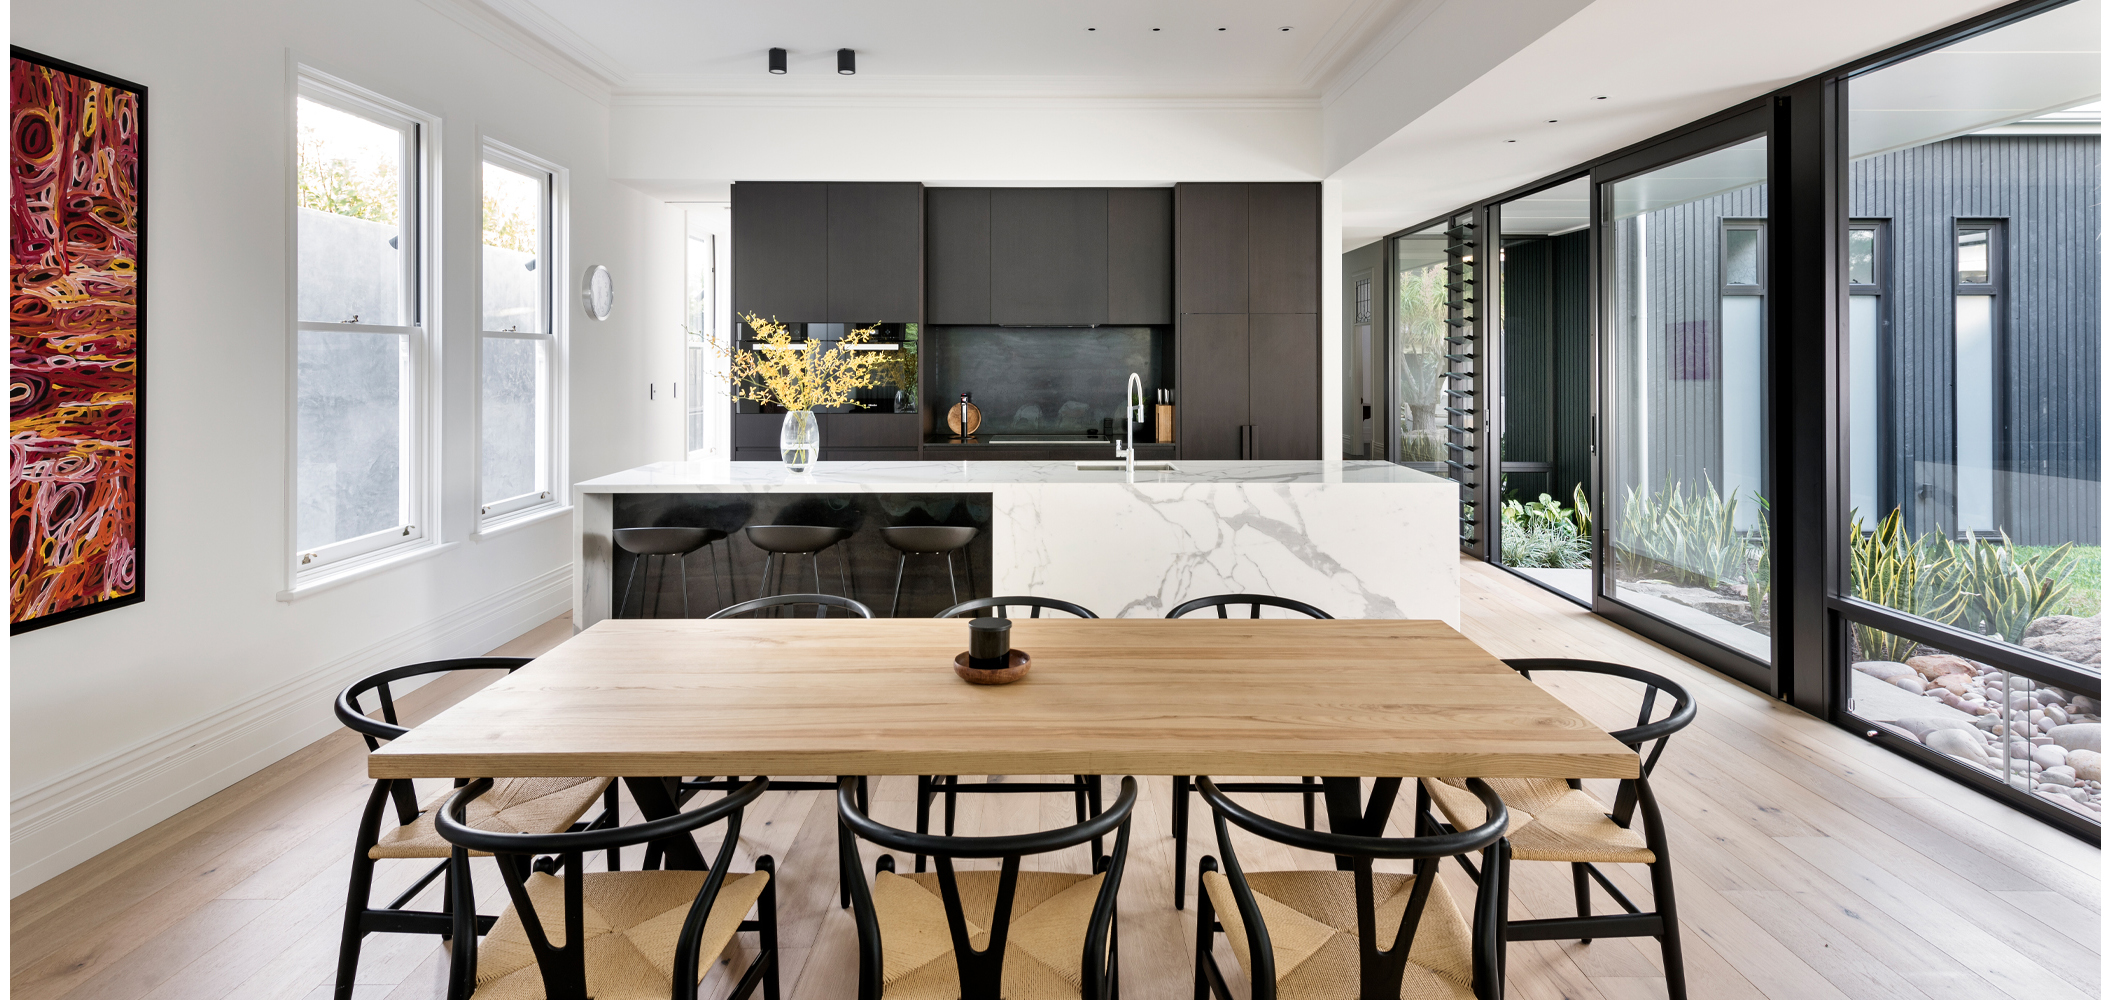 maek-luxury-home-design-inspiration-mosmanpark-27m-gallery-6.jpg